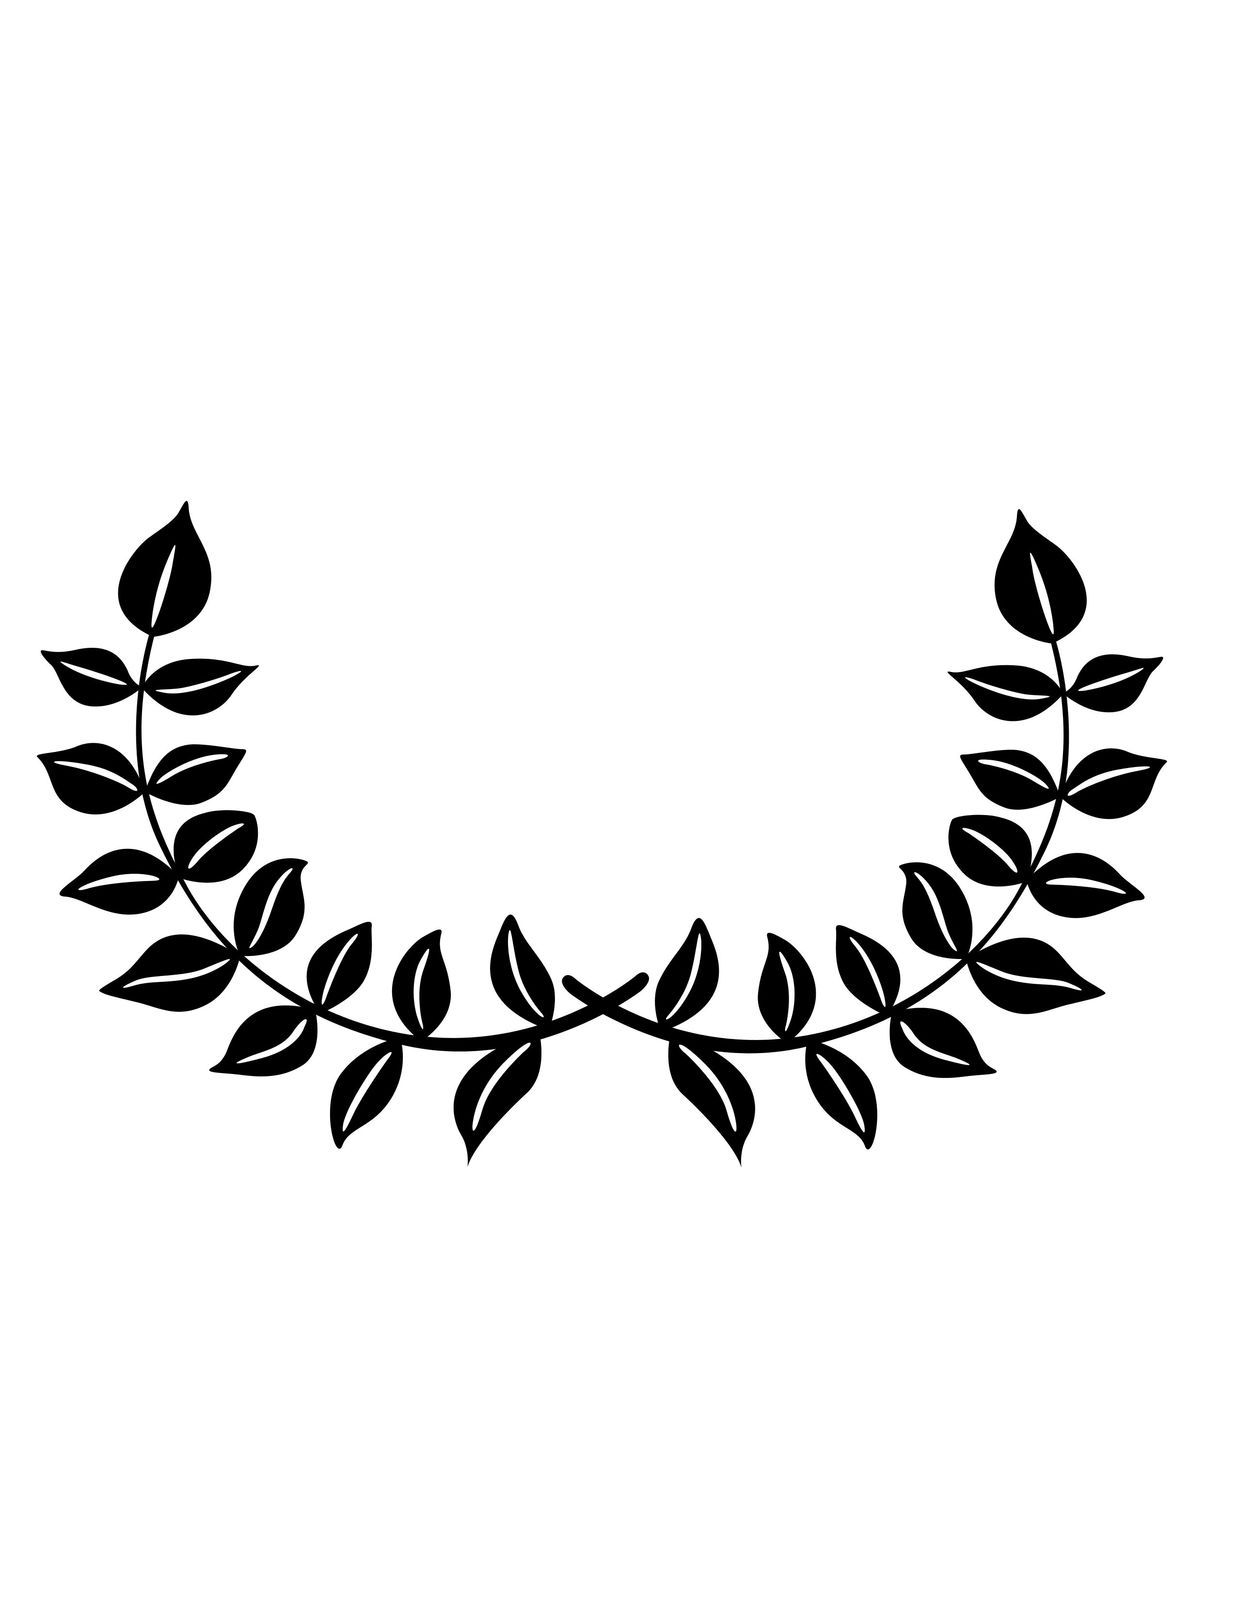 Vines clipart calligraphy. Vine leafy silhouette black